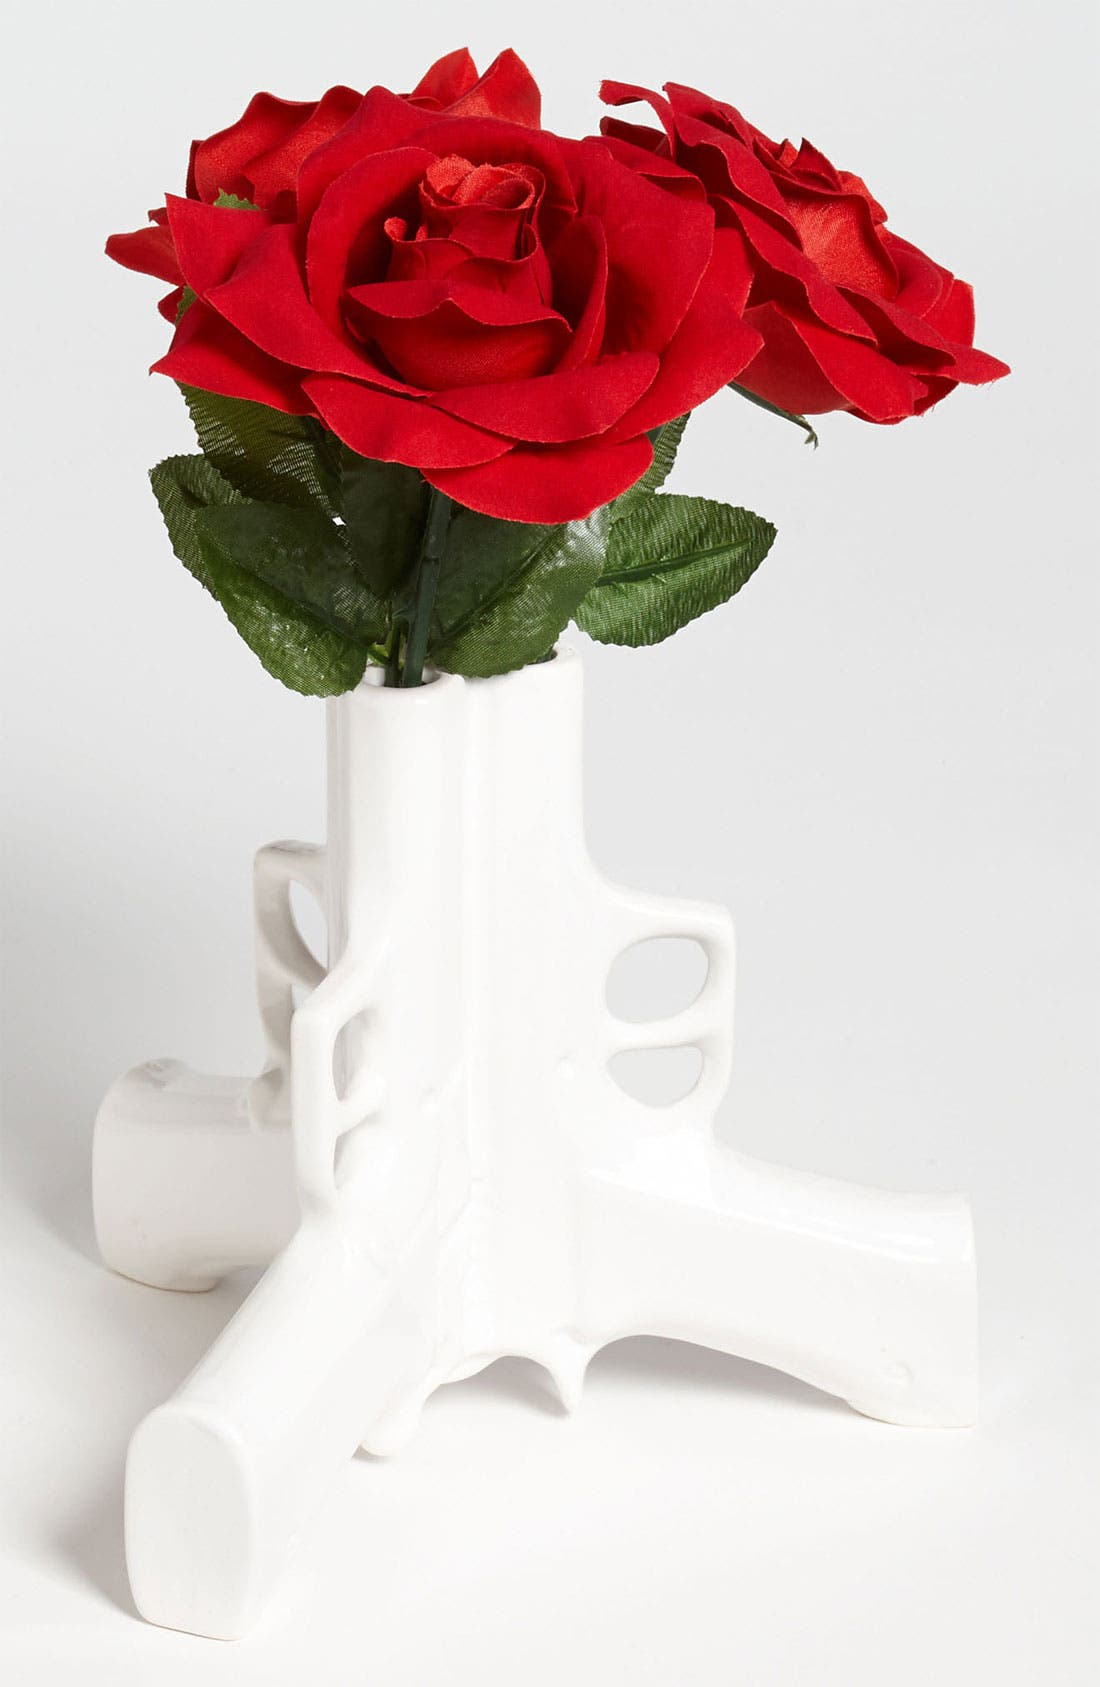 Alternate Image 1 Selected - Suck UK 'Pistol' Ceramic Table Vase